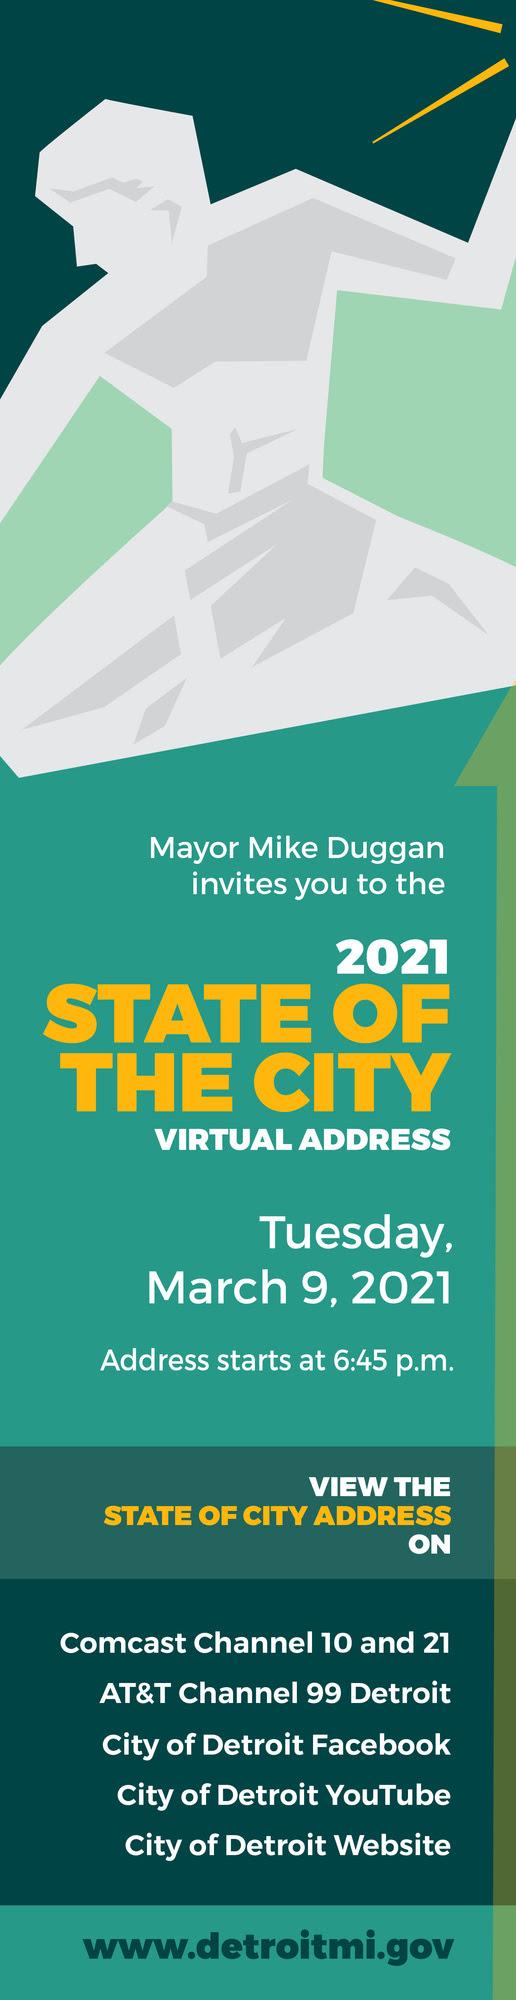 Mayor's 2021 State of the City Address